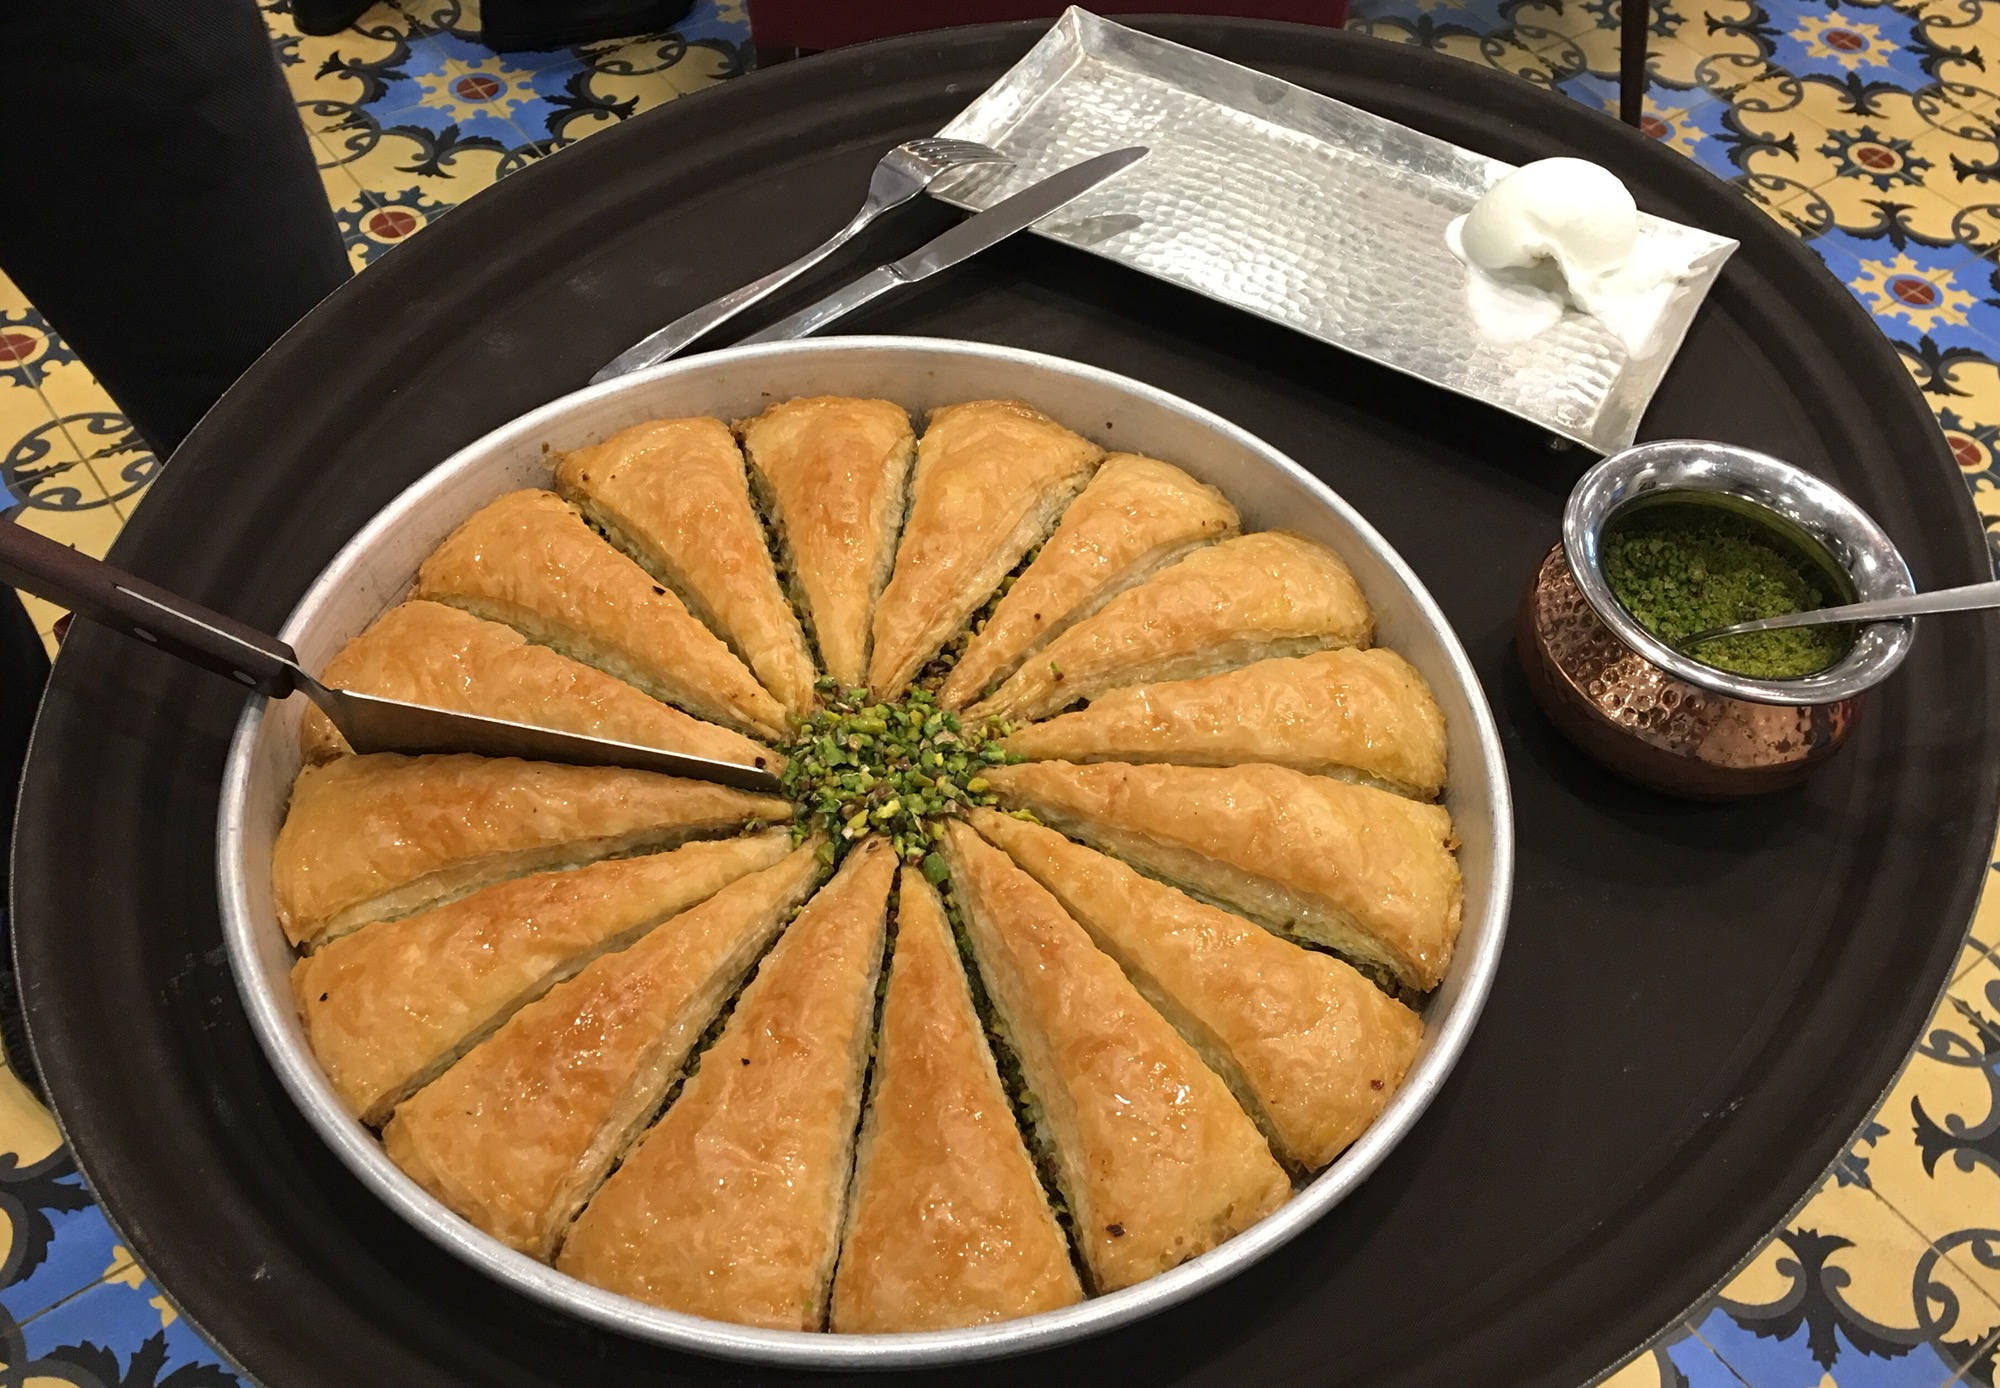 Turkish Lunch At Bosporus Restaurant The Dubai Mall Megsbloggedcom